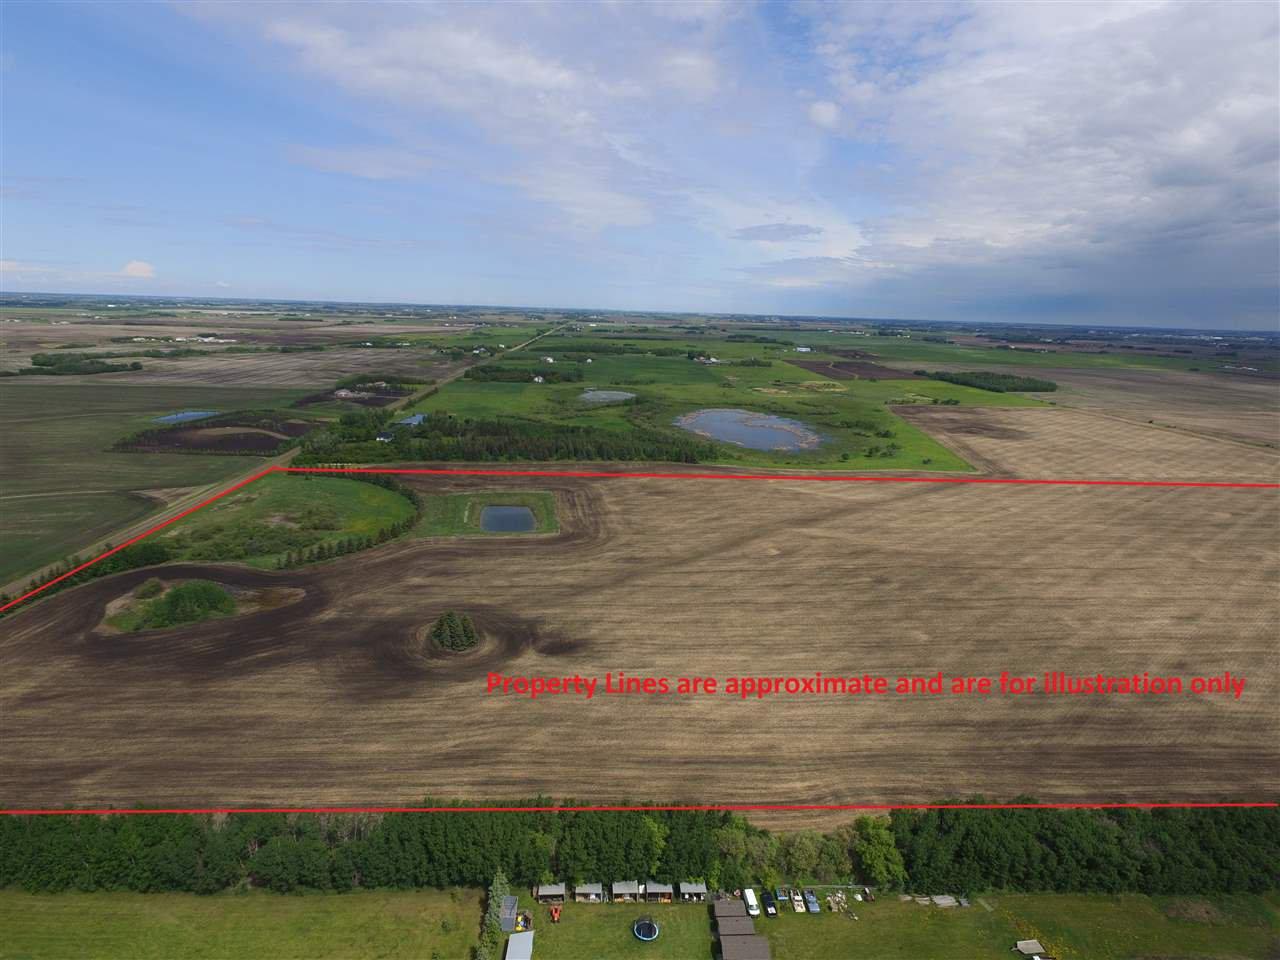 Main Photo: Twsp 551 Range Road 260: Rural Sturgeon County Rural Land/Vacant Lot for sale : MLS®# E4093989